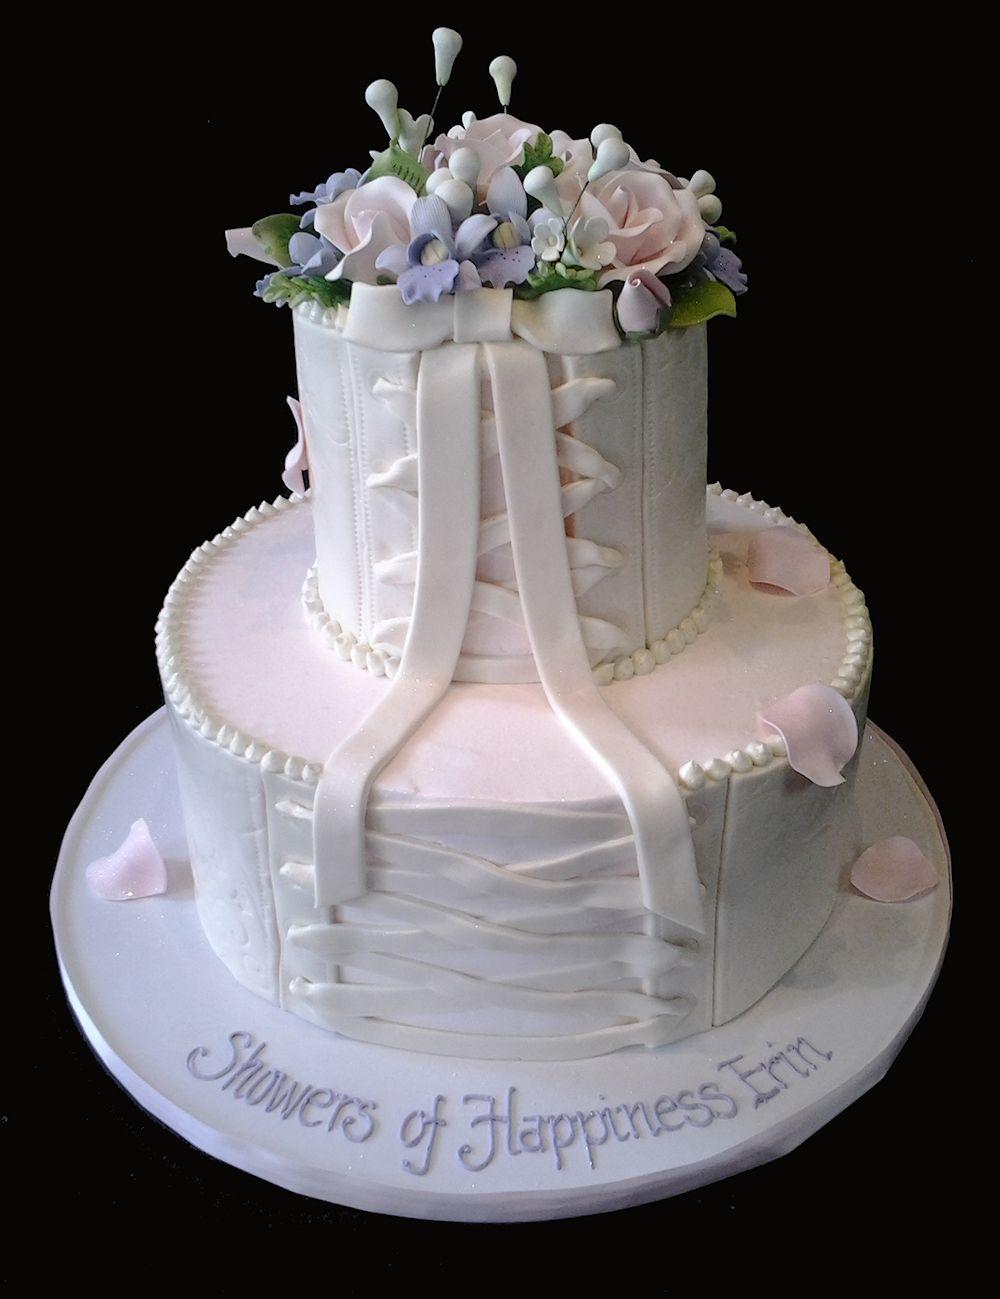 Walmart Bridal Shower Cakes : walmart, bridal, shower, cakes, Graceful, Bridal, Shower, Cakes, Walmart, Romantic, Wedding, Cake,, Cakes,, Gorgeous